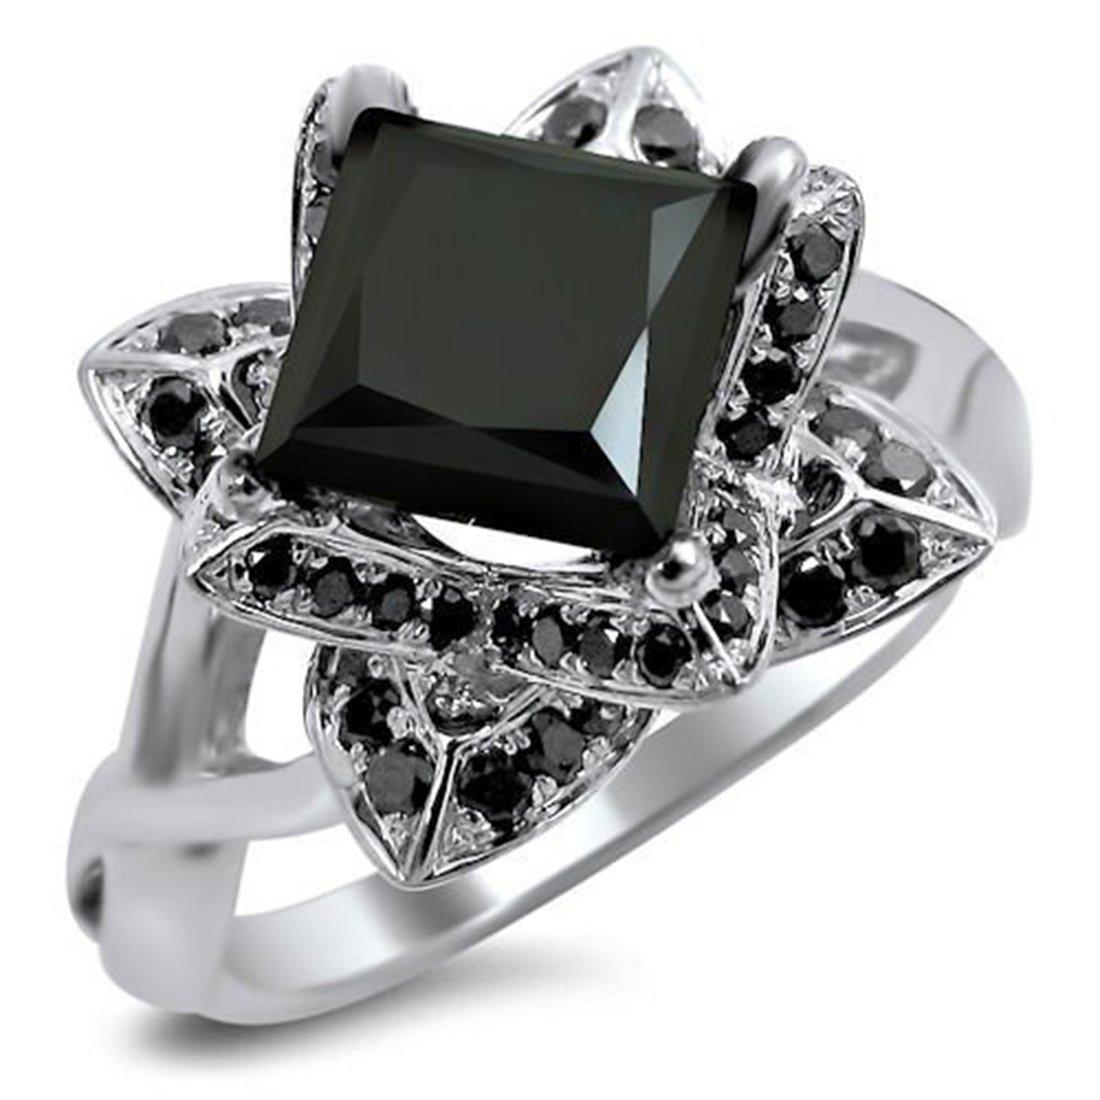 Smjewels 2.0 Ct Black Princess Cut Lotus Flower Sim.Diamond Engagement Ring 14K White Gold Fn